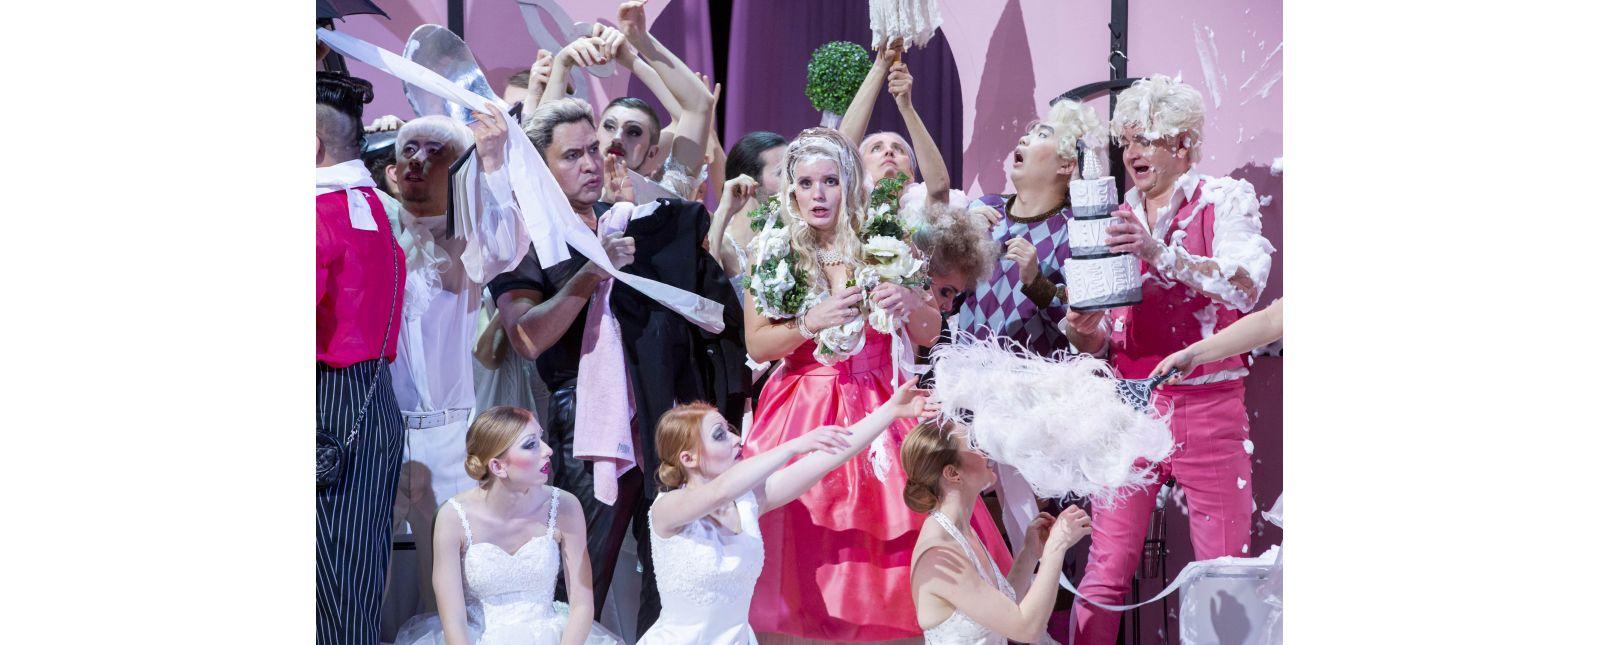 Die Hochzeit des Figaro // Jin Seok Lee / Juan Orozco / Sarah Traubel / Anja Jung / Seonghwan Koo / Michael Borth / Statisterie / Opernchor // 2020 // Rainer Muranyi